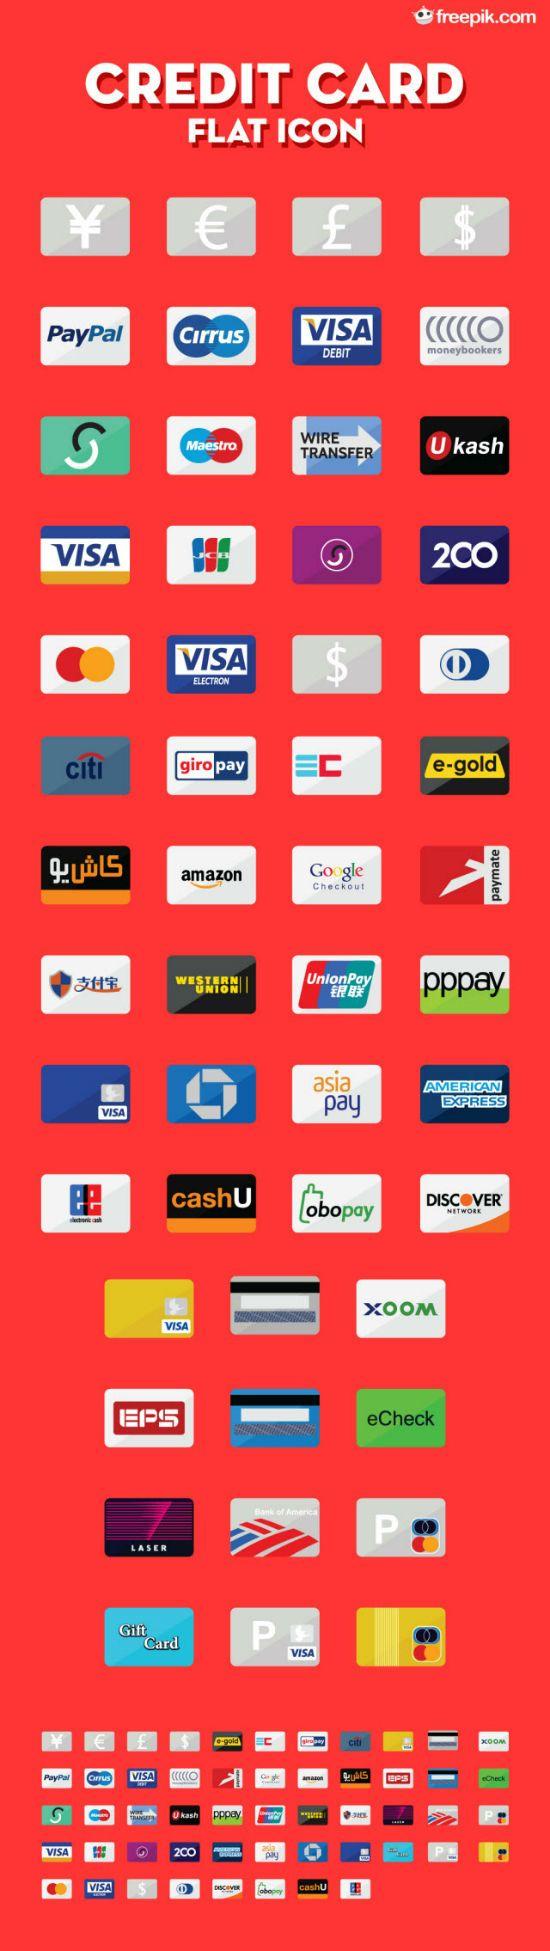 E-commerce Freebie on Noupe: 50+ Credit Card Flat Icons by Freepik